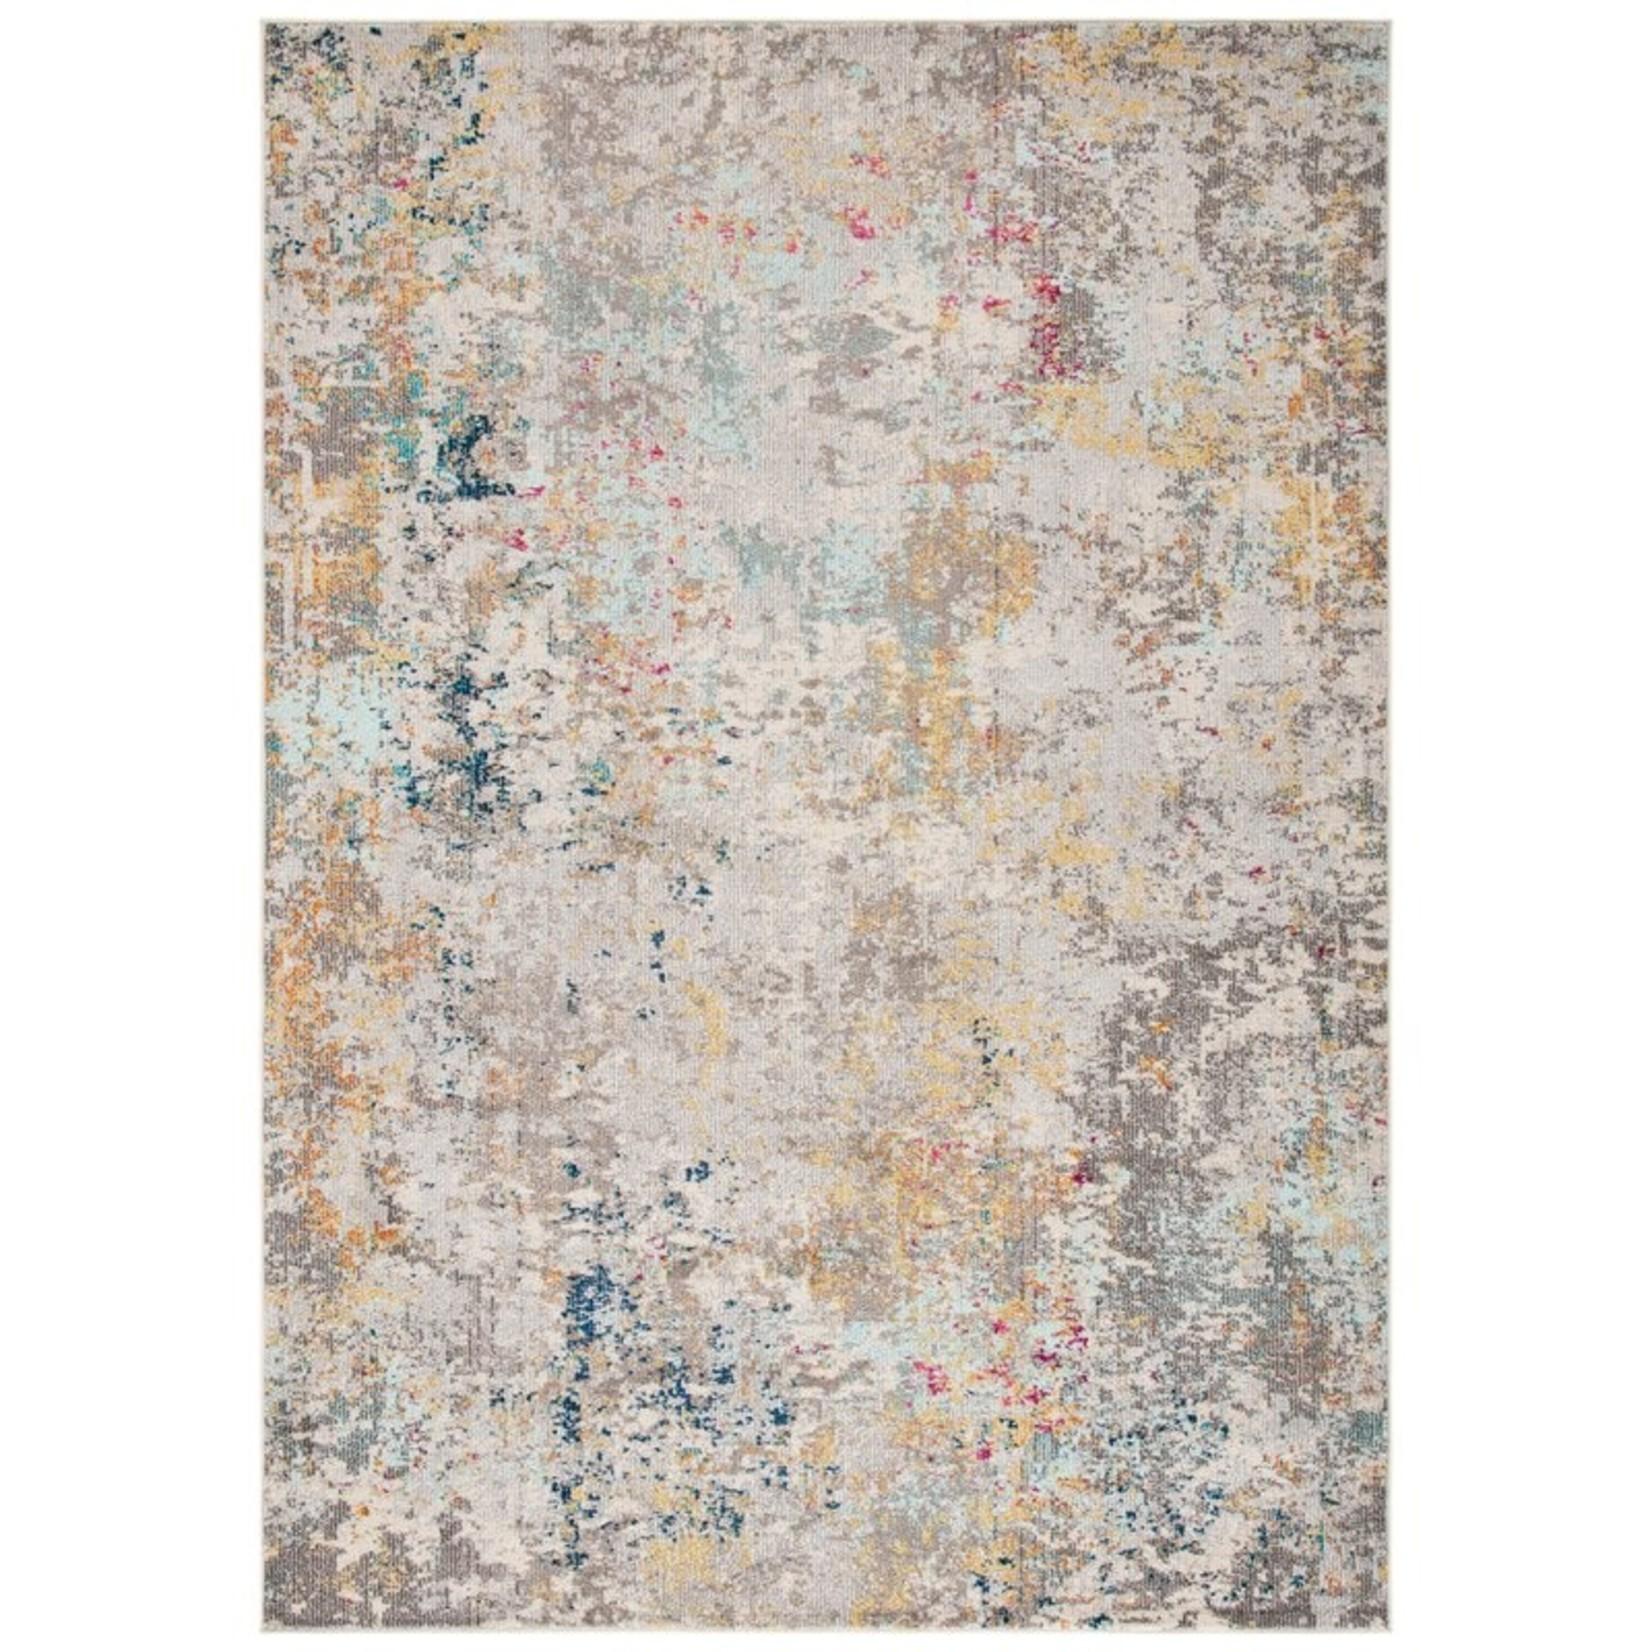 *10' x 14' - Abderus Beige/Grey Area Rug